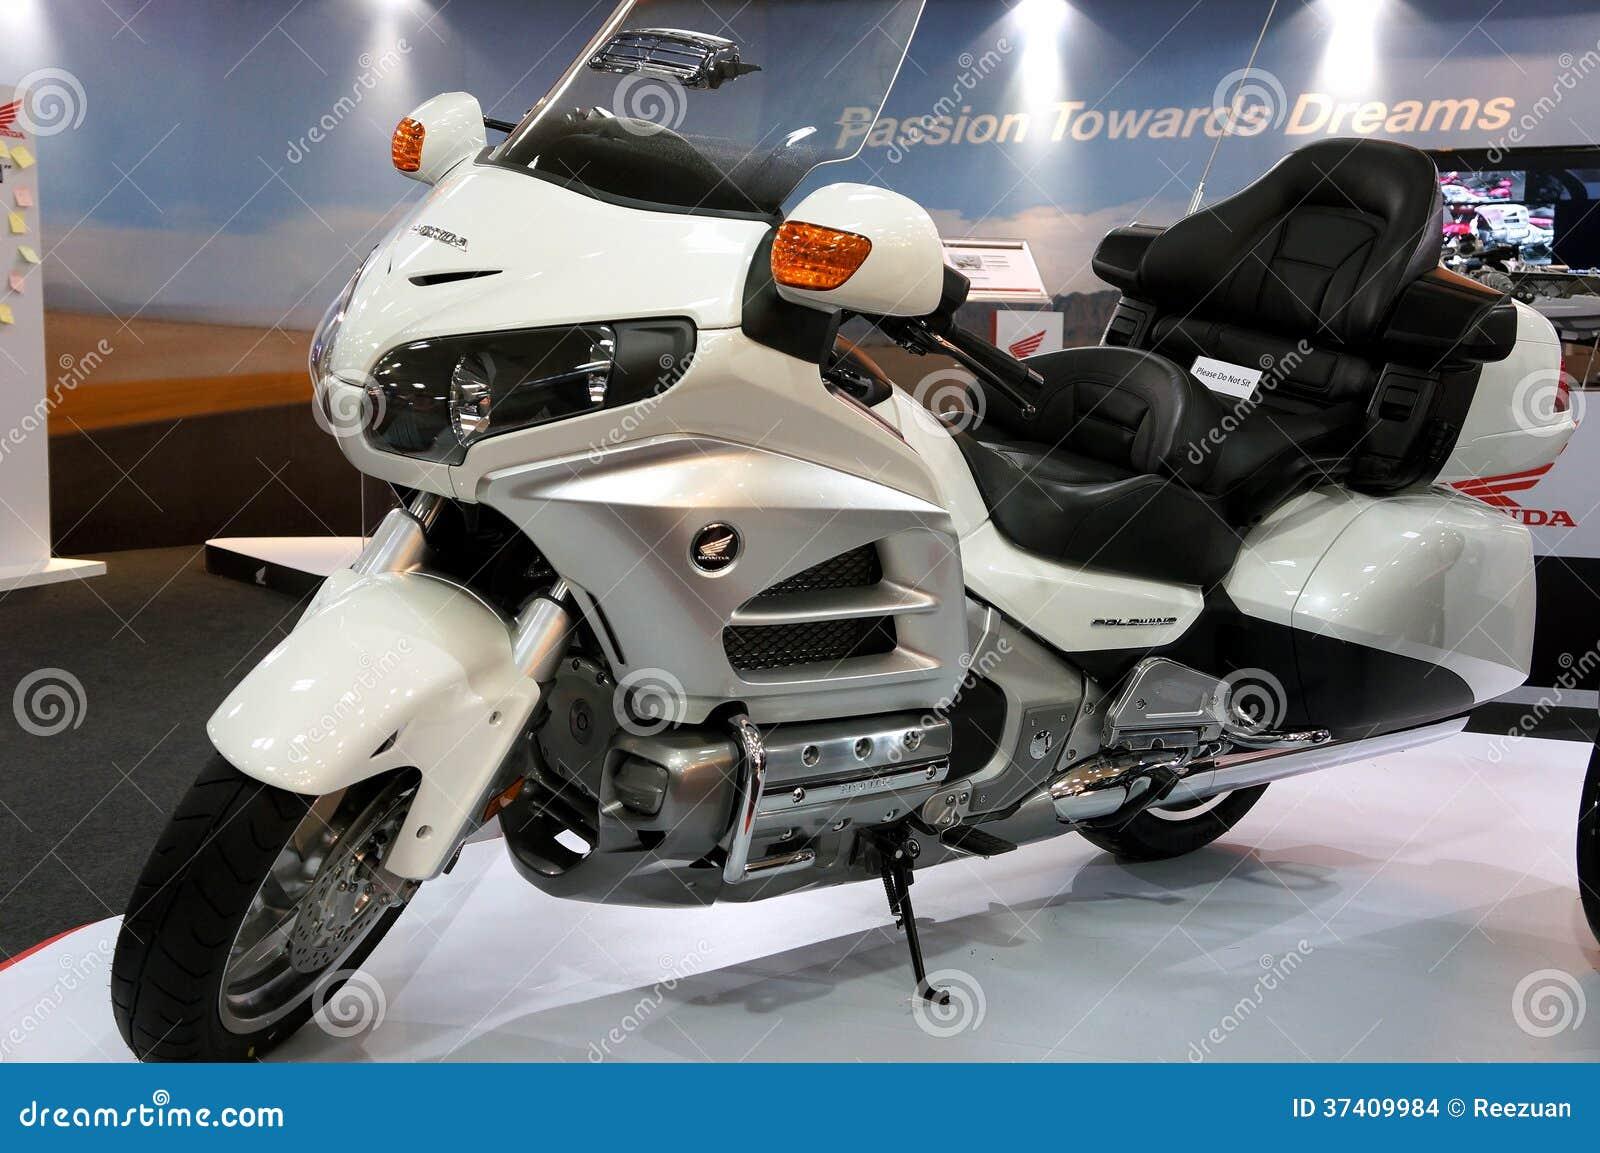 Honda Goldwing 1800cc Editorial Stock Image Image Of Fair 37409984